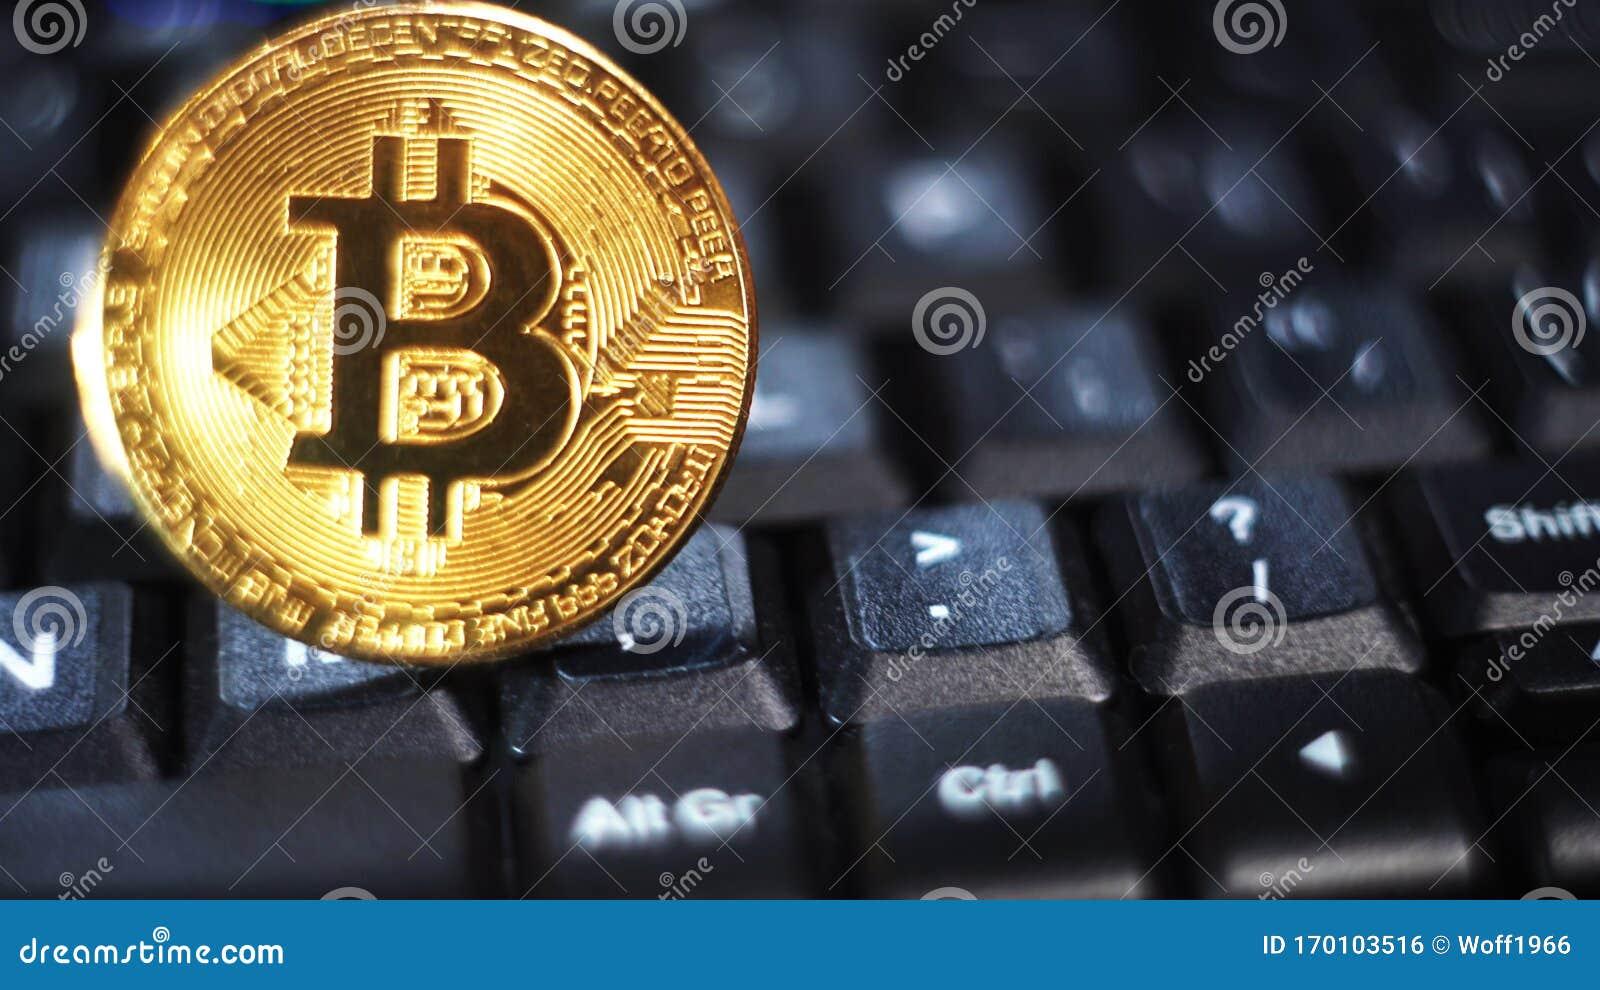 satoshi la bitcoin payza la btc